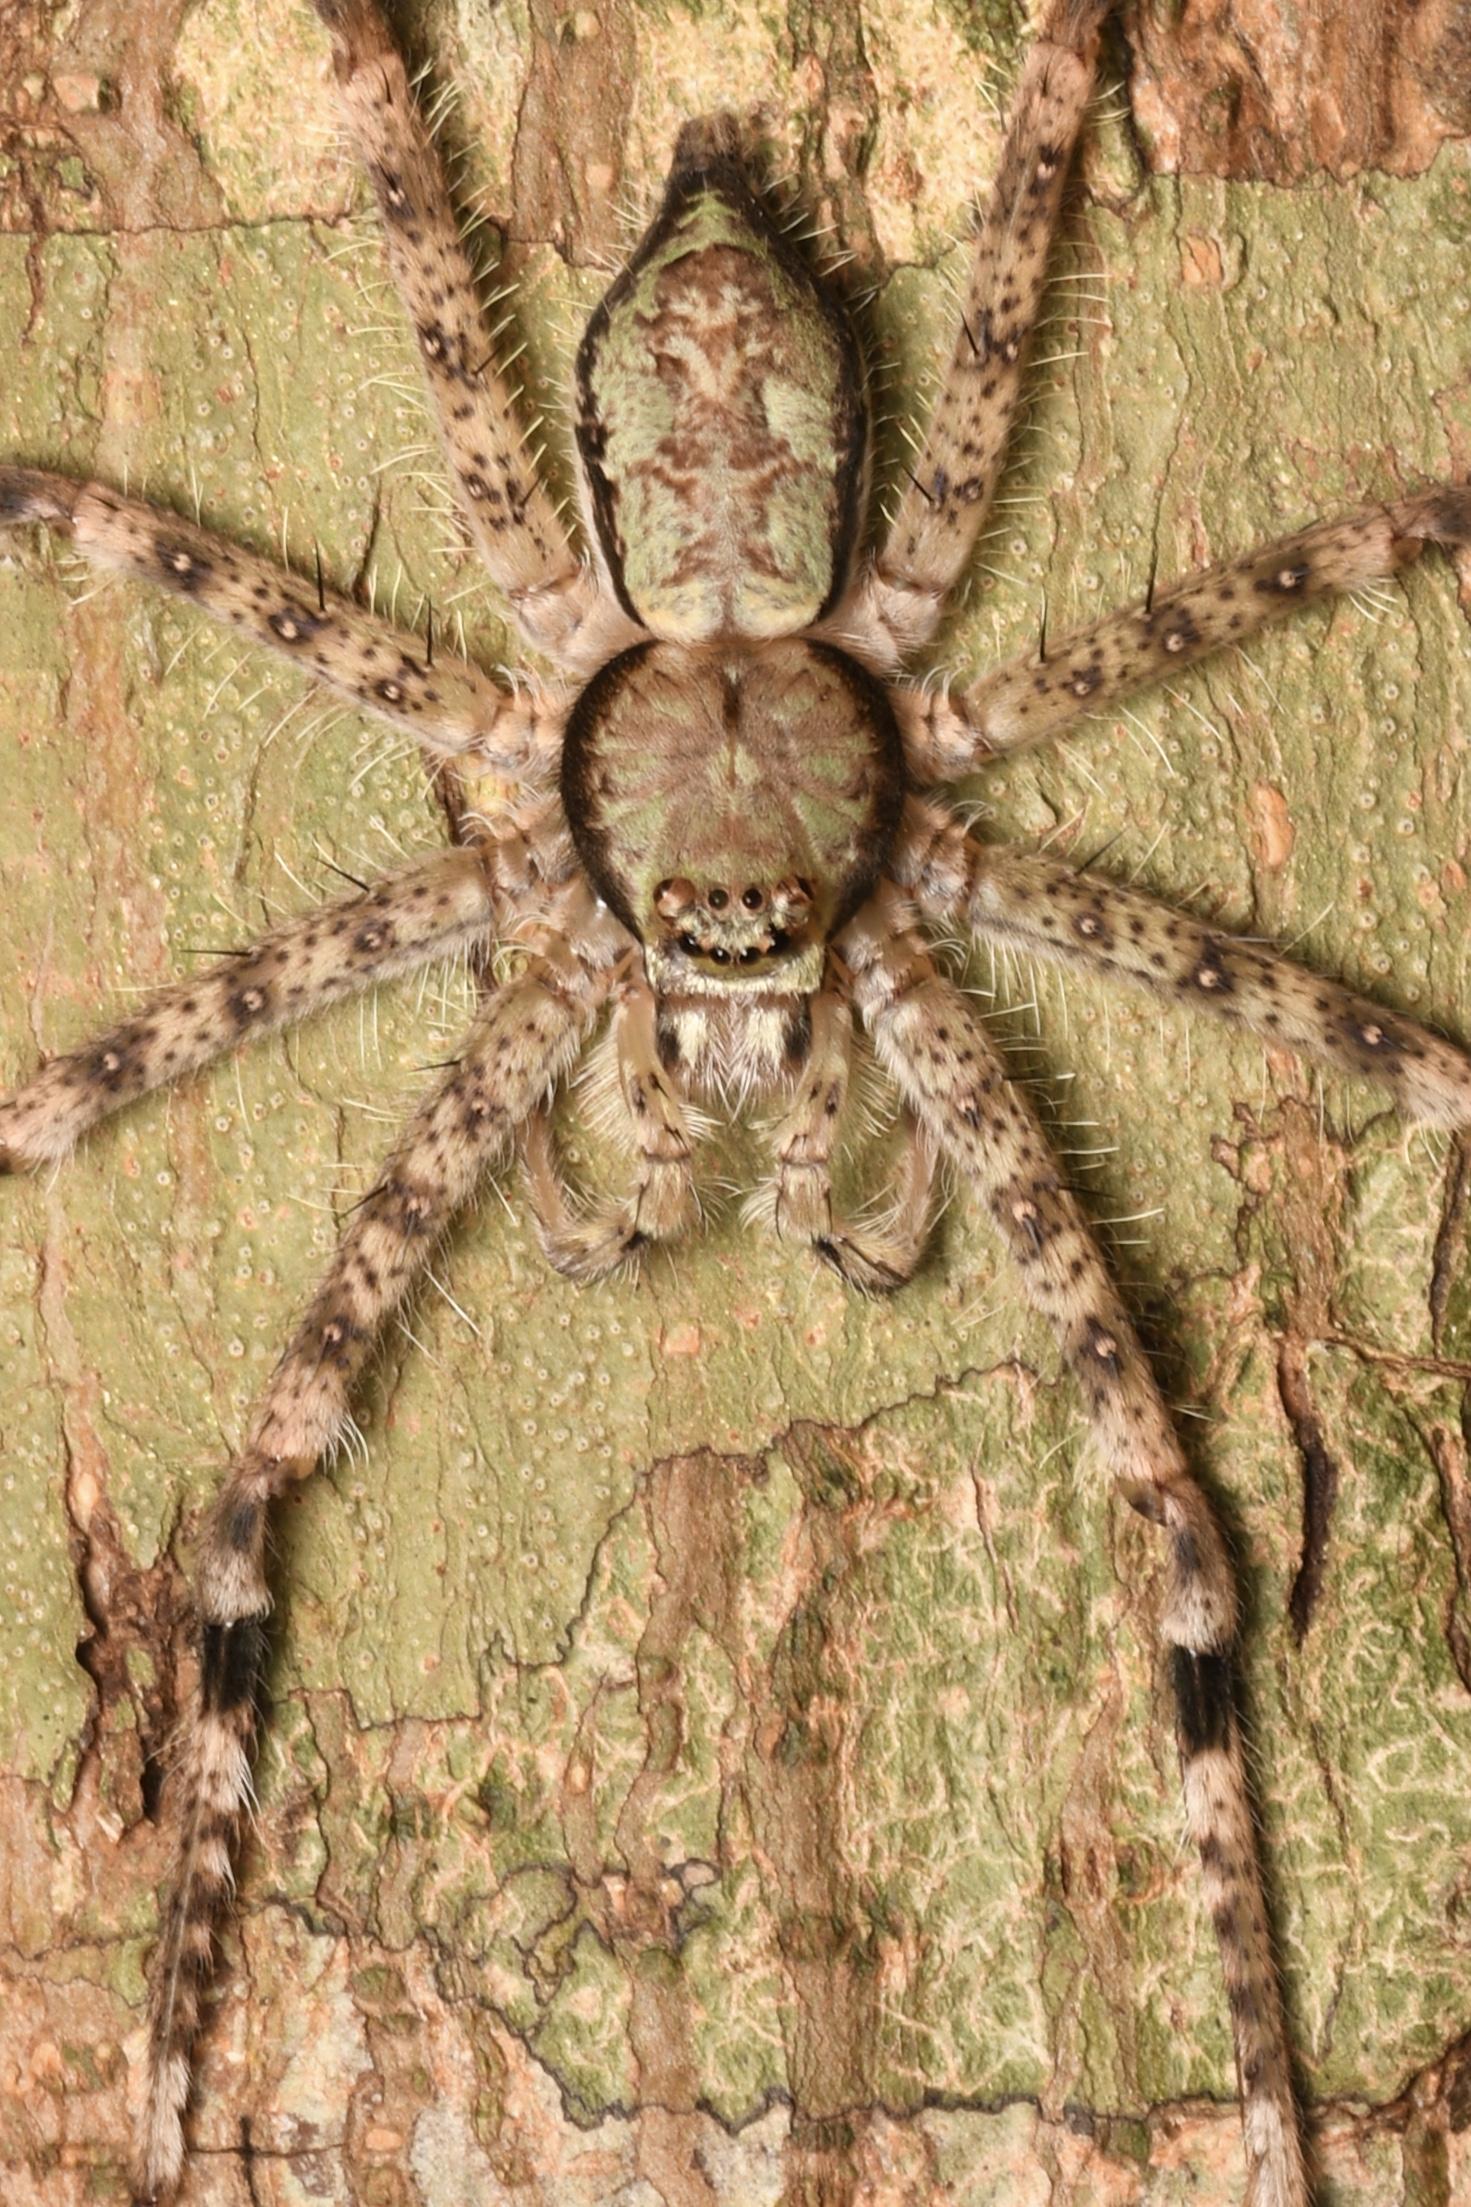 Lichen Huntsman Spider ( Pandercetes  sp.),   Telaga Tujuh, Langkawi Island, Malaysia  • Nikon D500, Tokina 100mm f/2.8 macro, Nikon SB900 @ 1/8 power with Alex Goh Macro Diffuser, ISO100, f/16, 1/60s